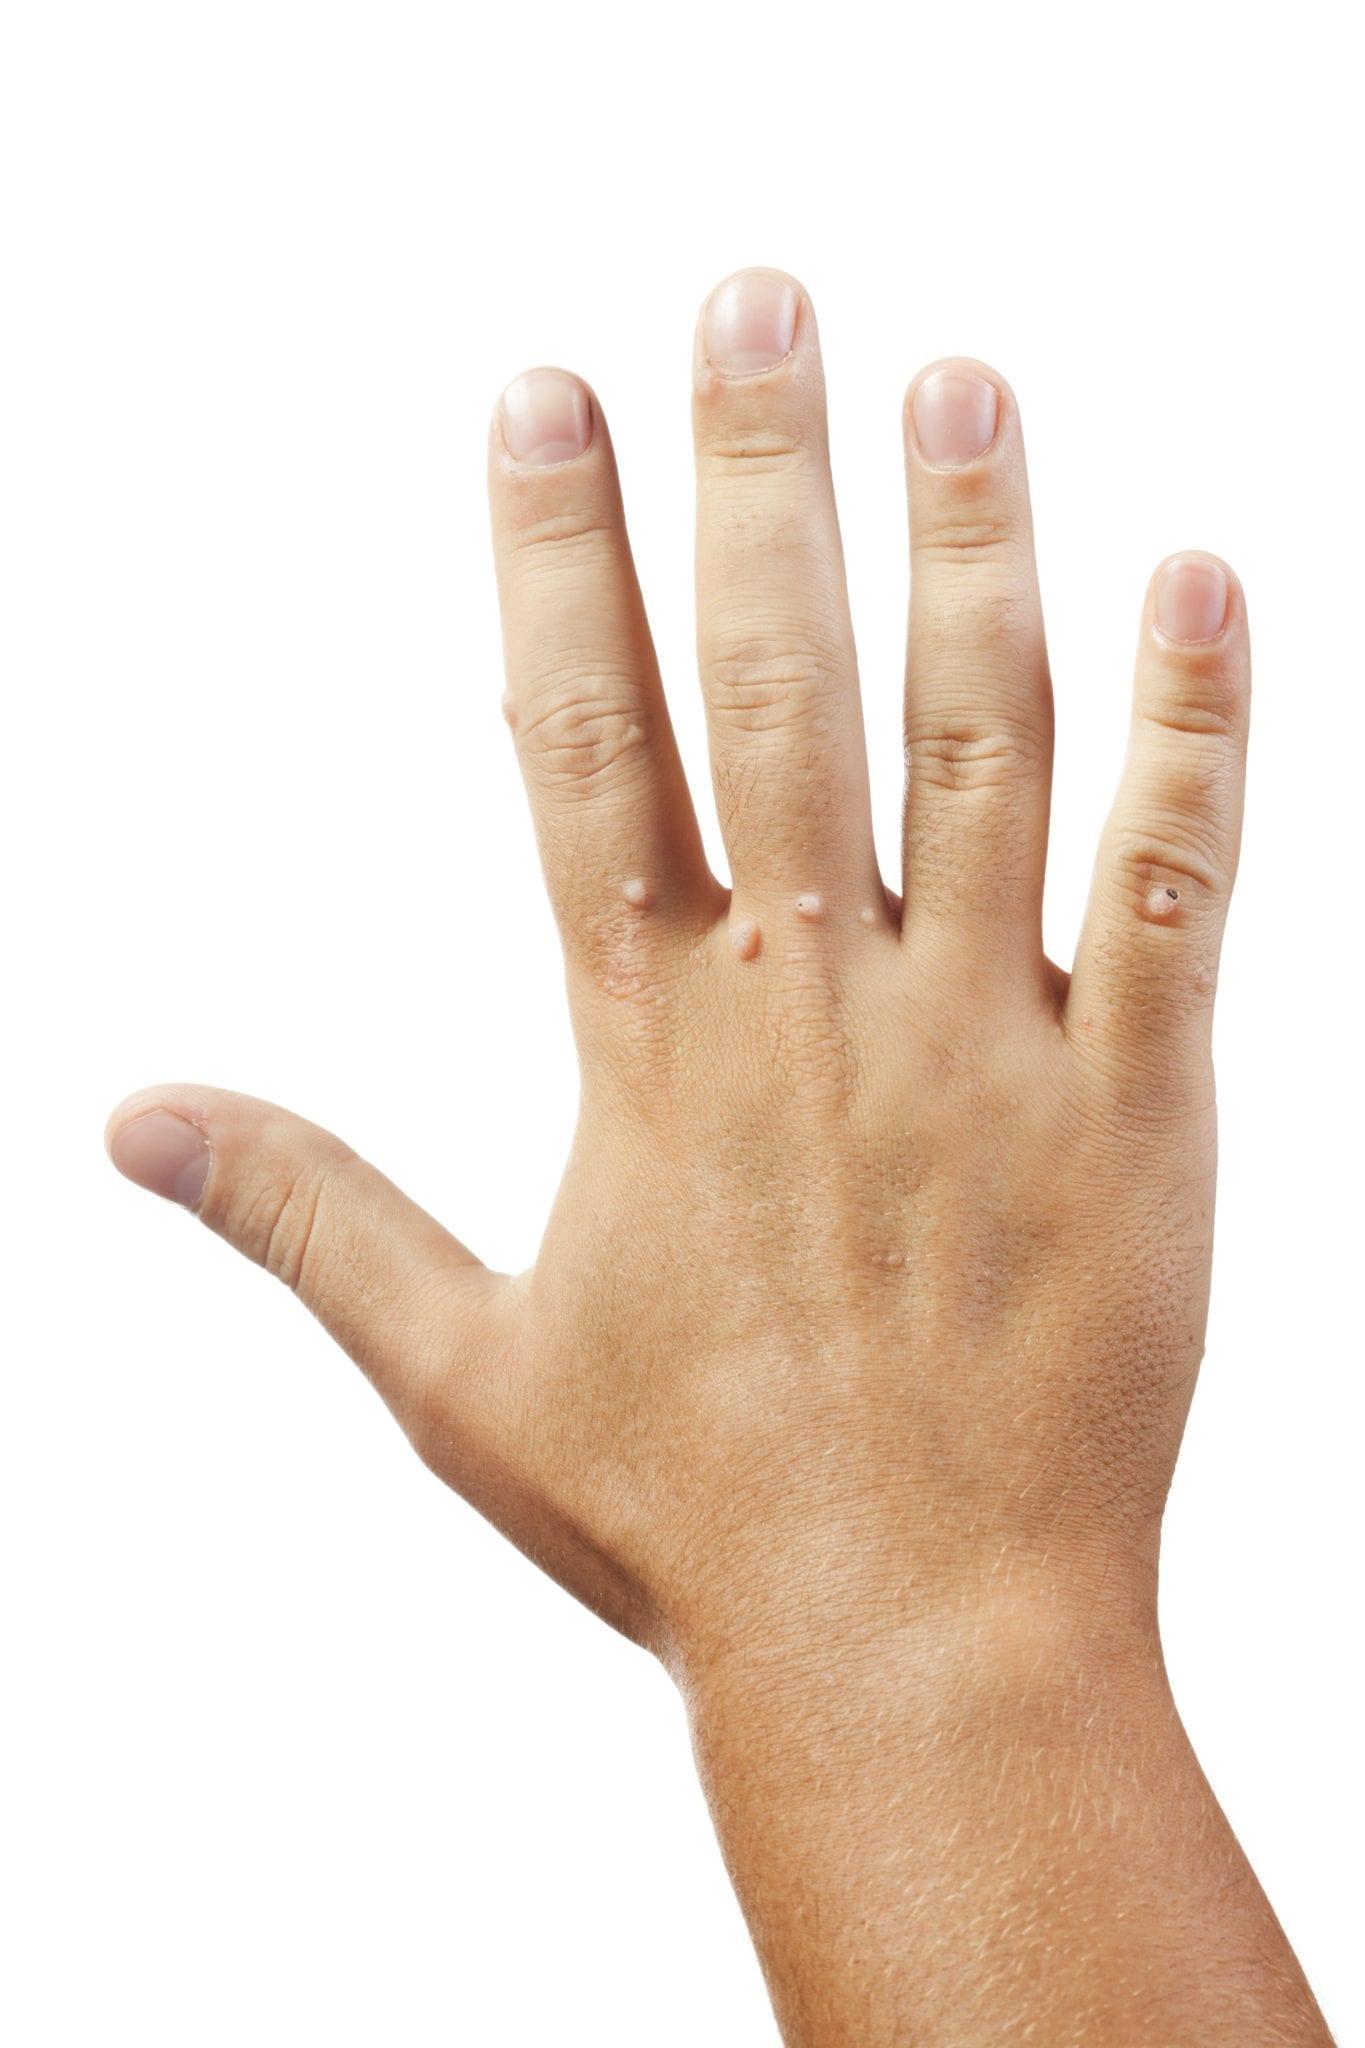 wart treatment hurts cancer bucal informacion